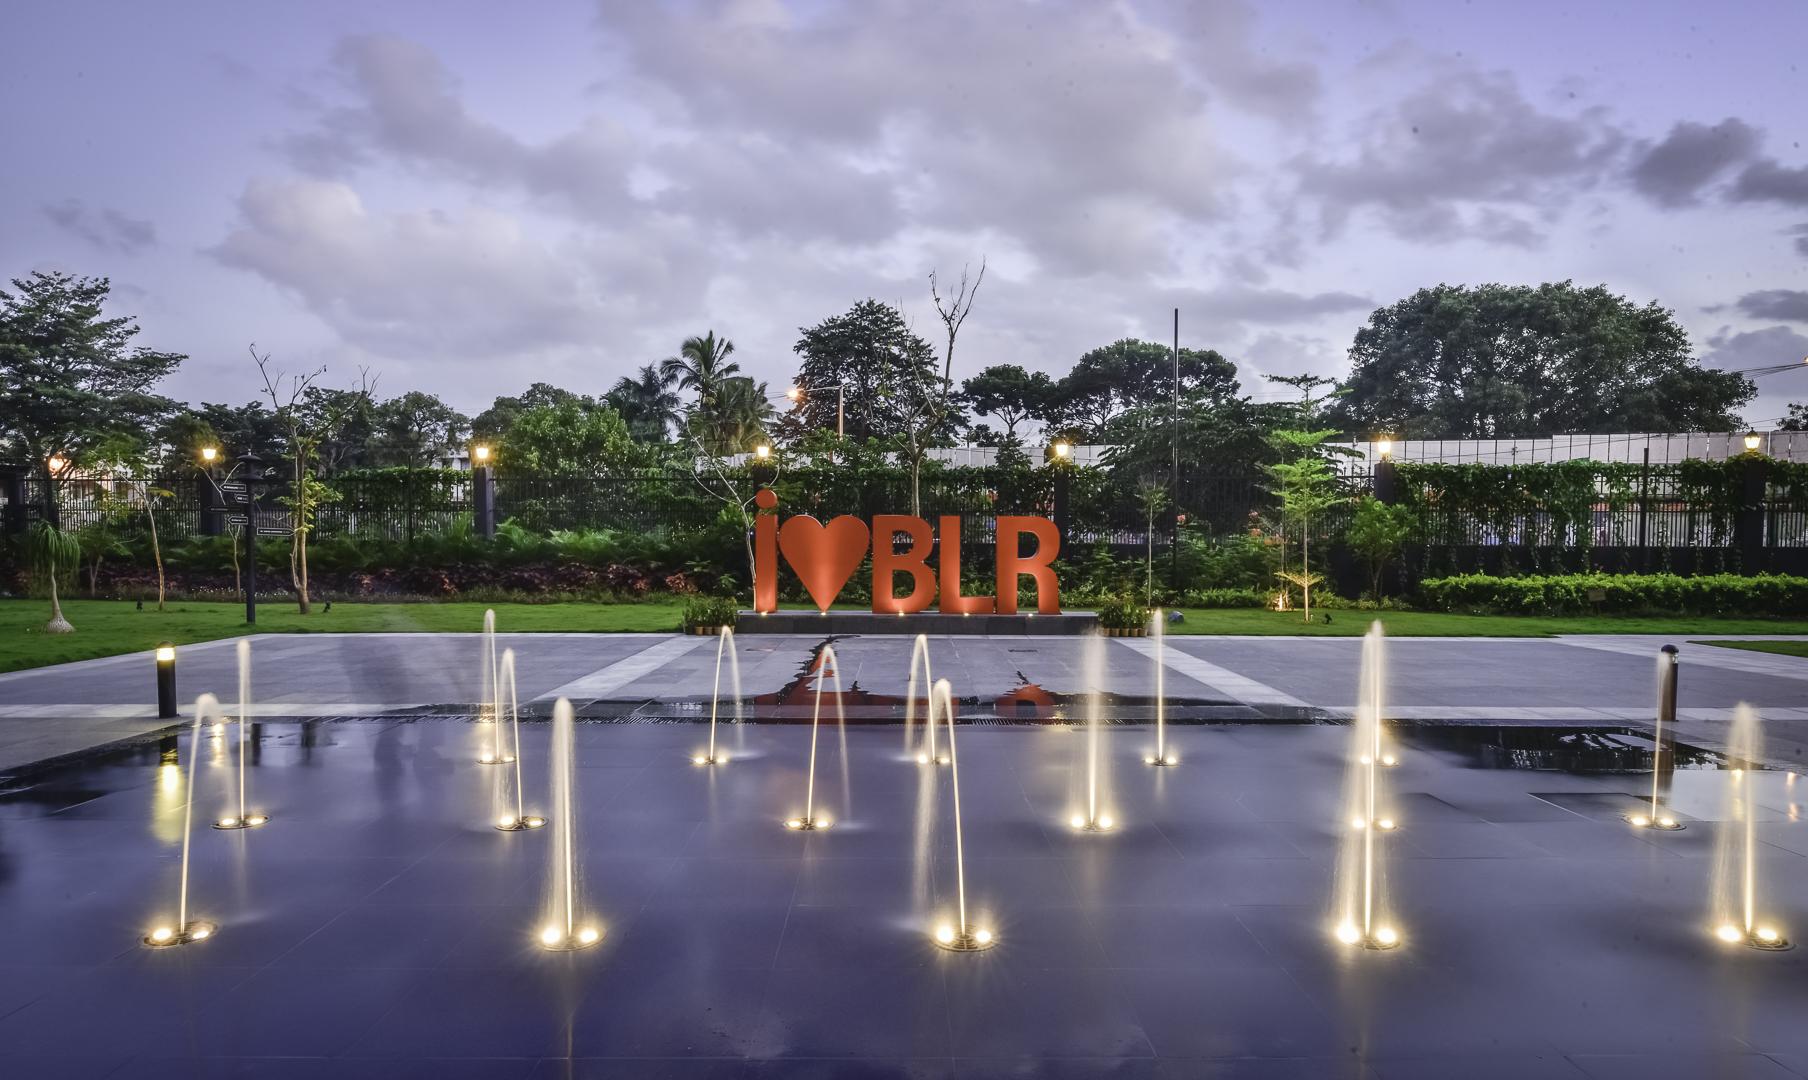 Garden City @ VR Bengaluru